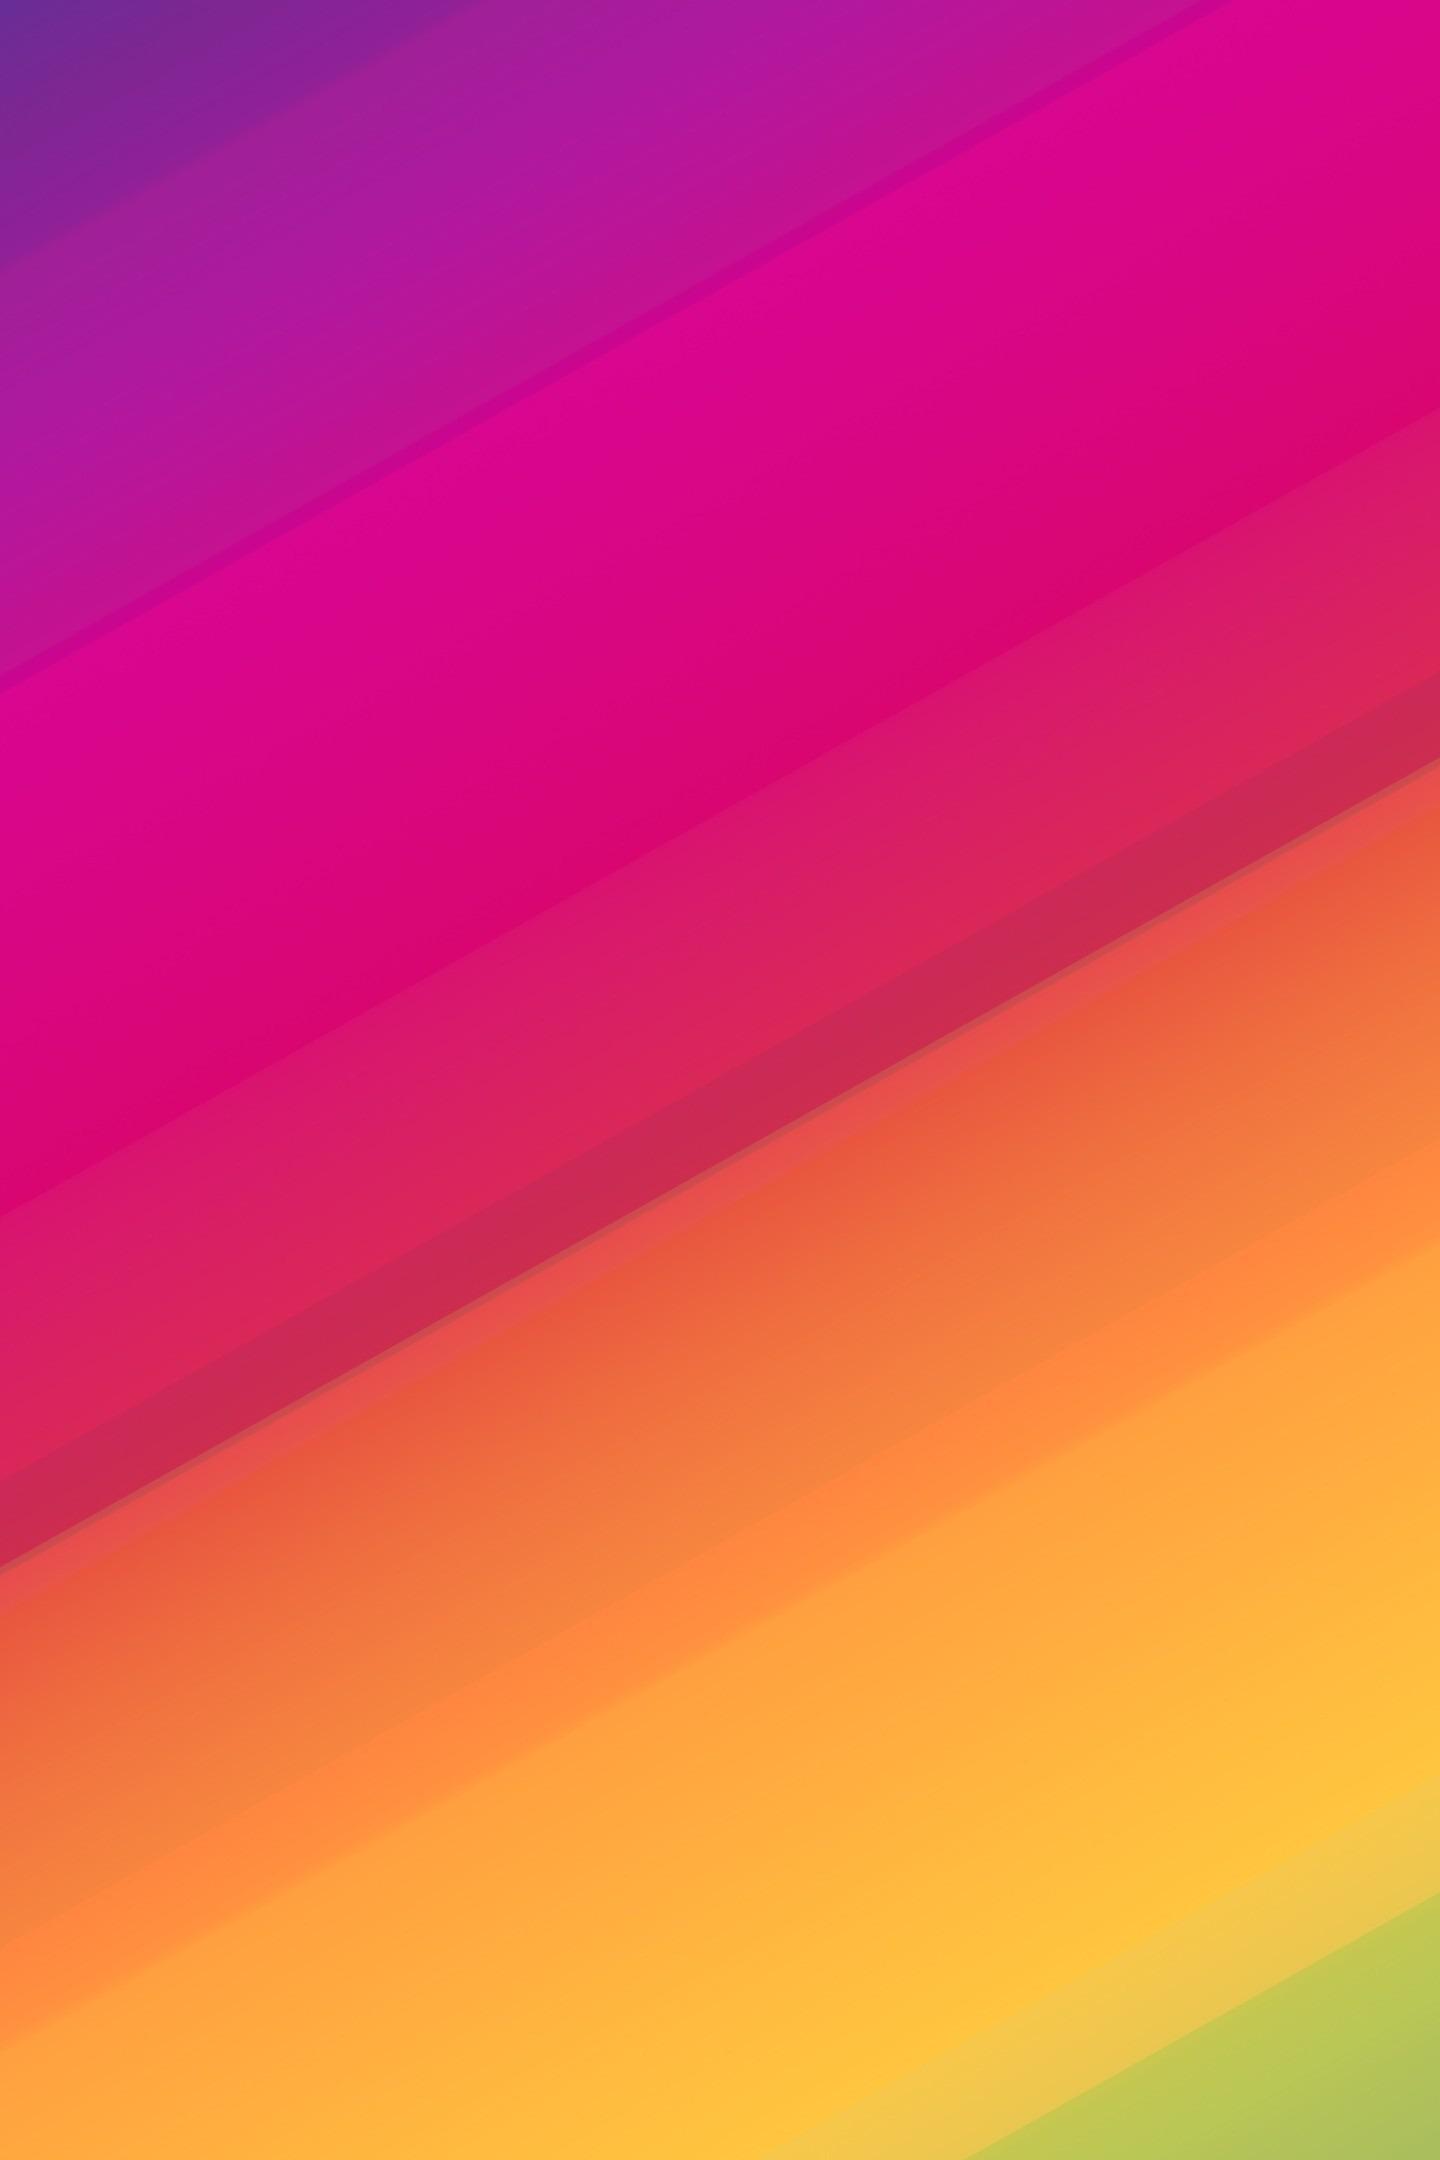 Colorful, Diagonal Stripes, Abstract, Diagonal, 1440X2880 Wallpaper